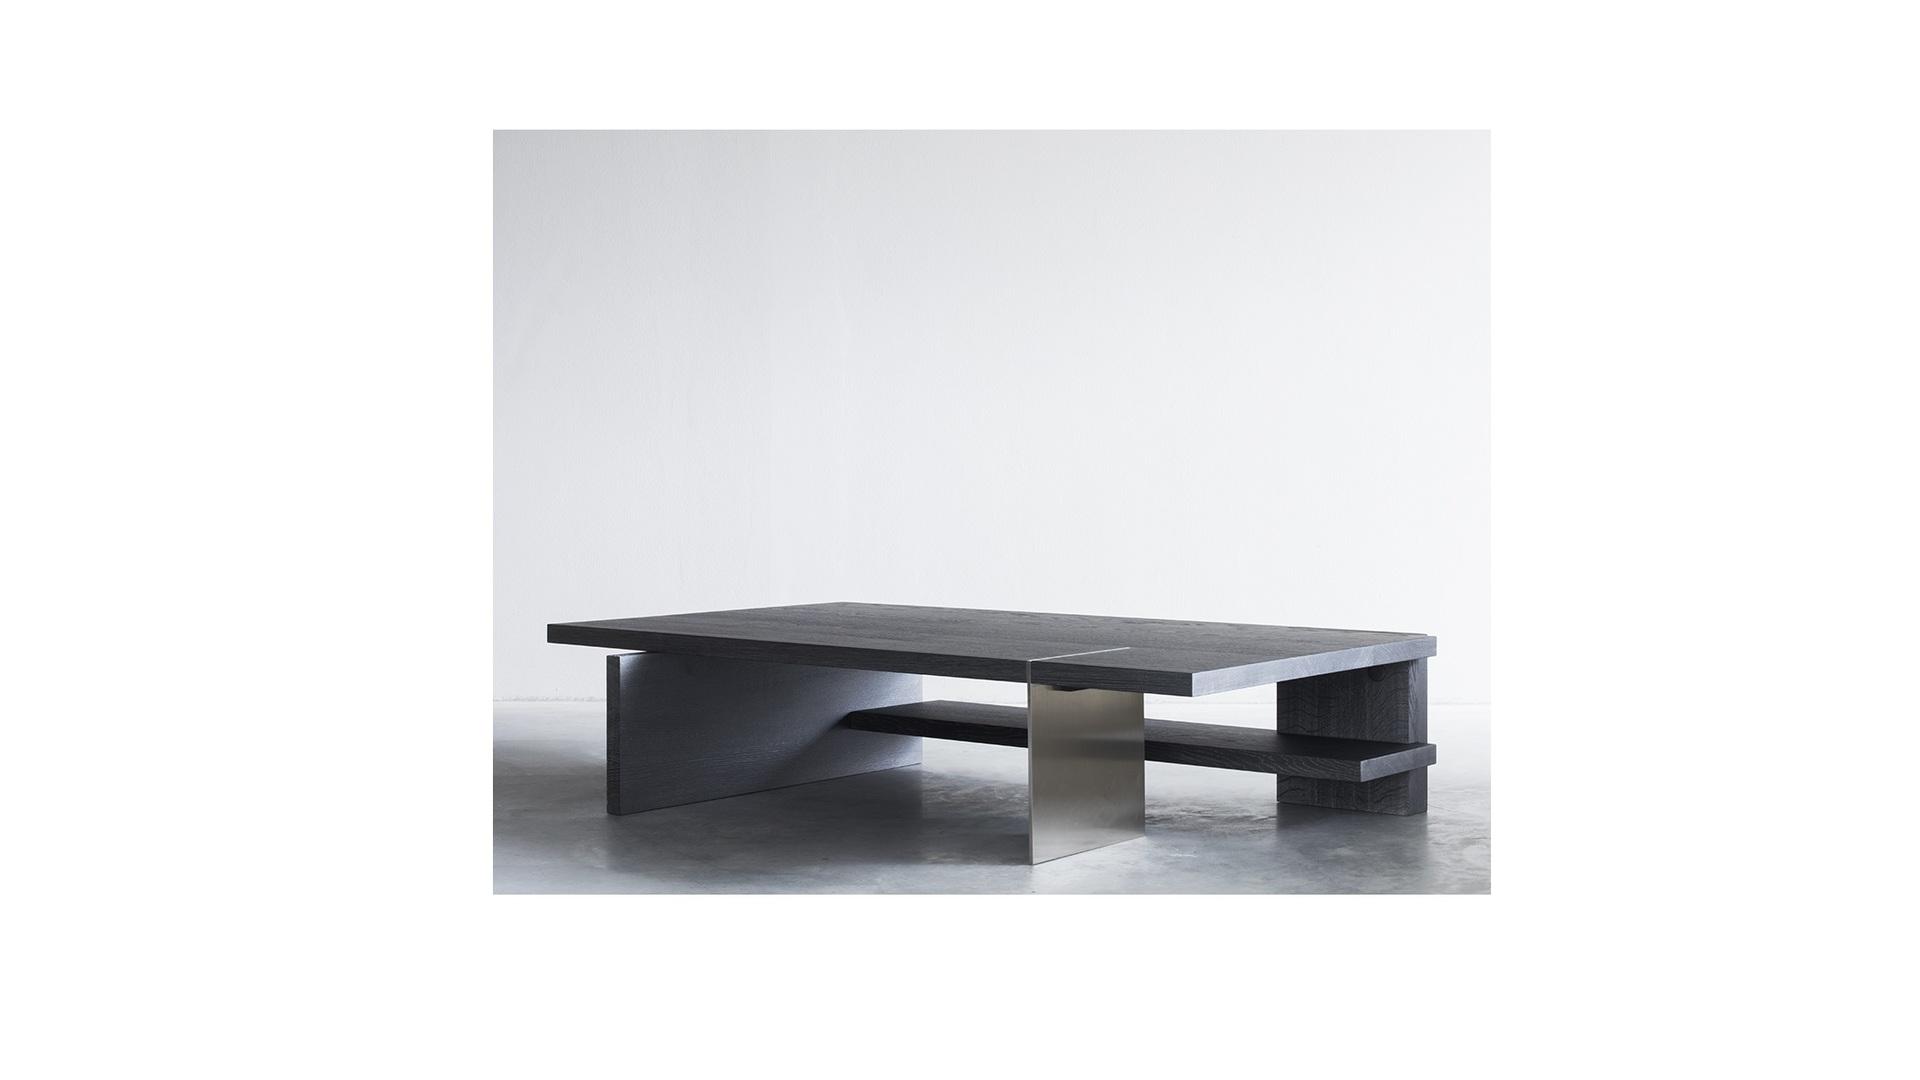 Stijl rectangular coffee table with nickel (1) klein.jpg